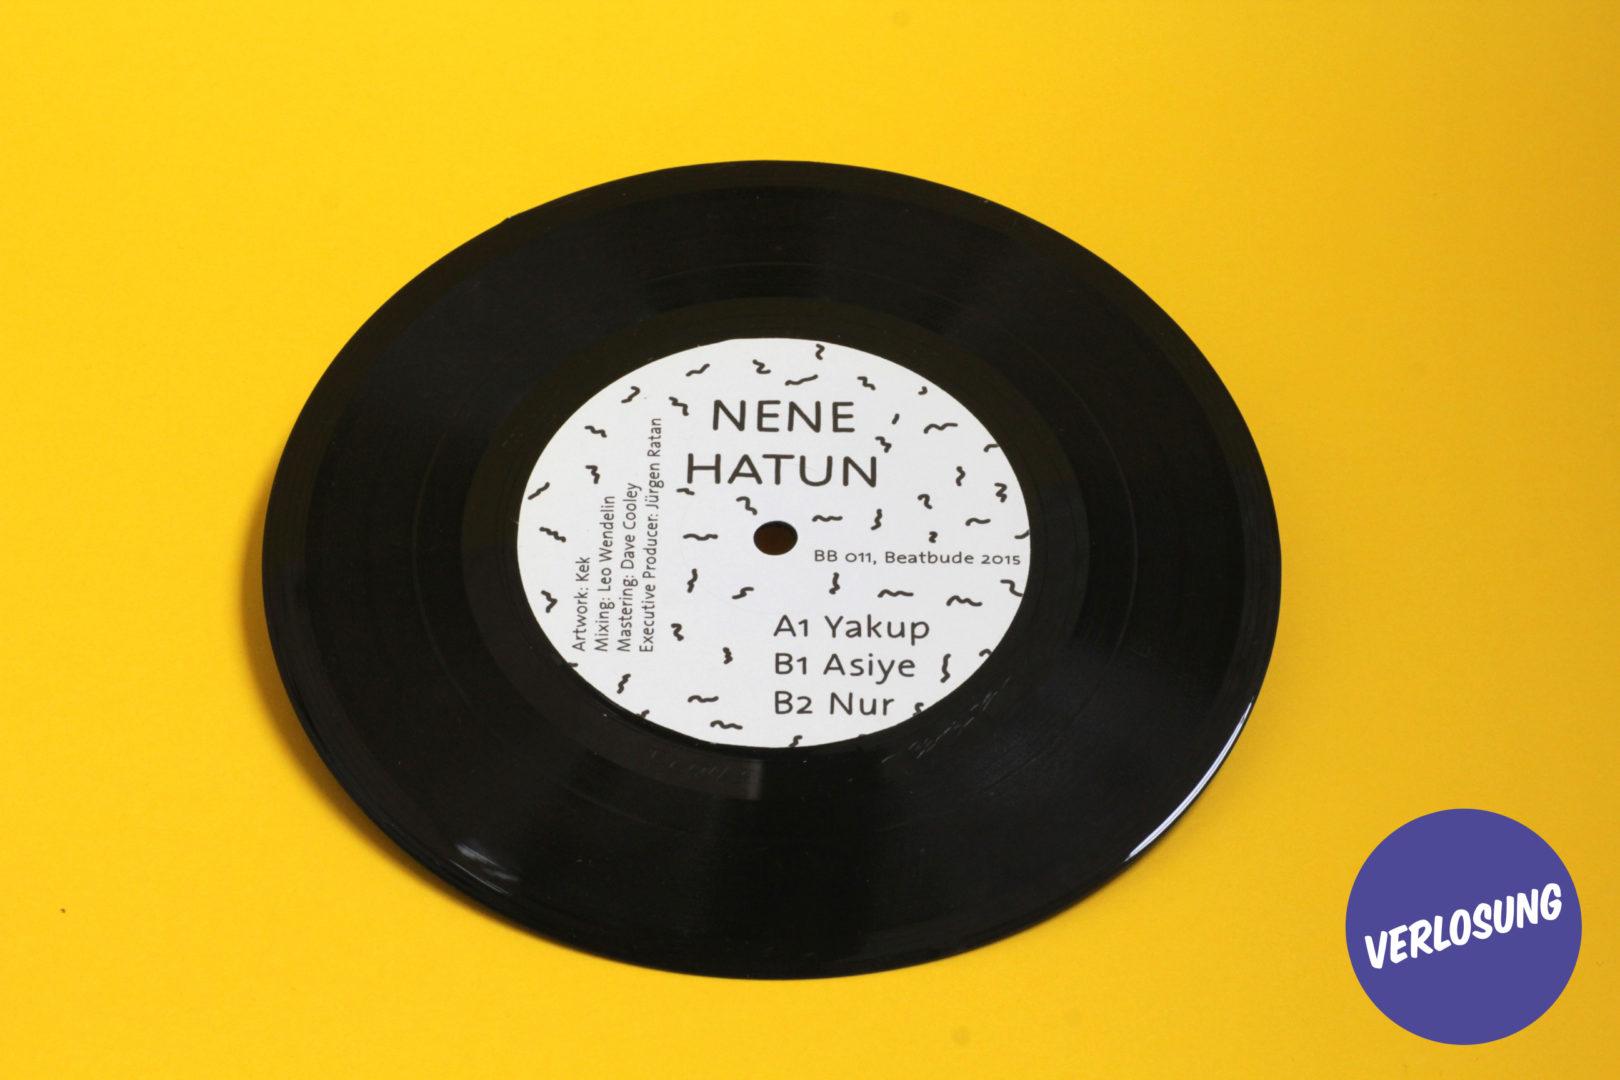 nene-hatun-vinyl-gewinnspiel-02_renk